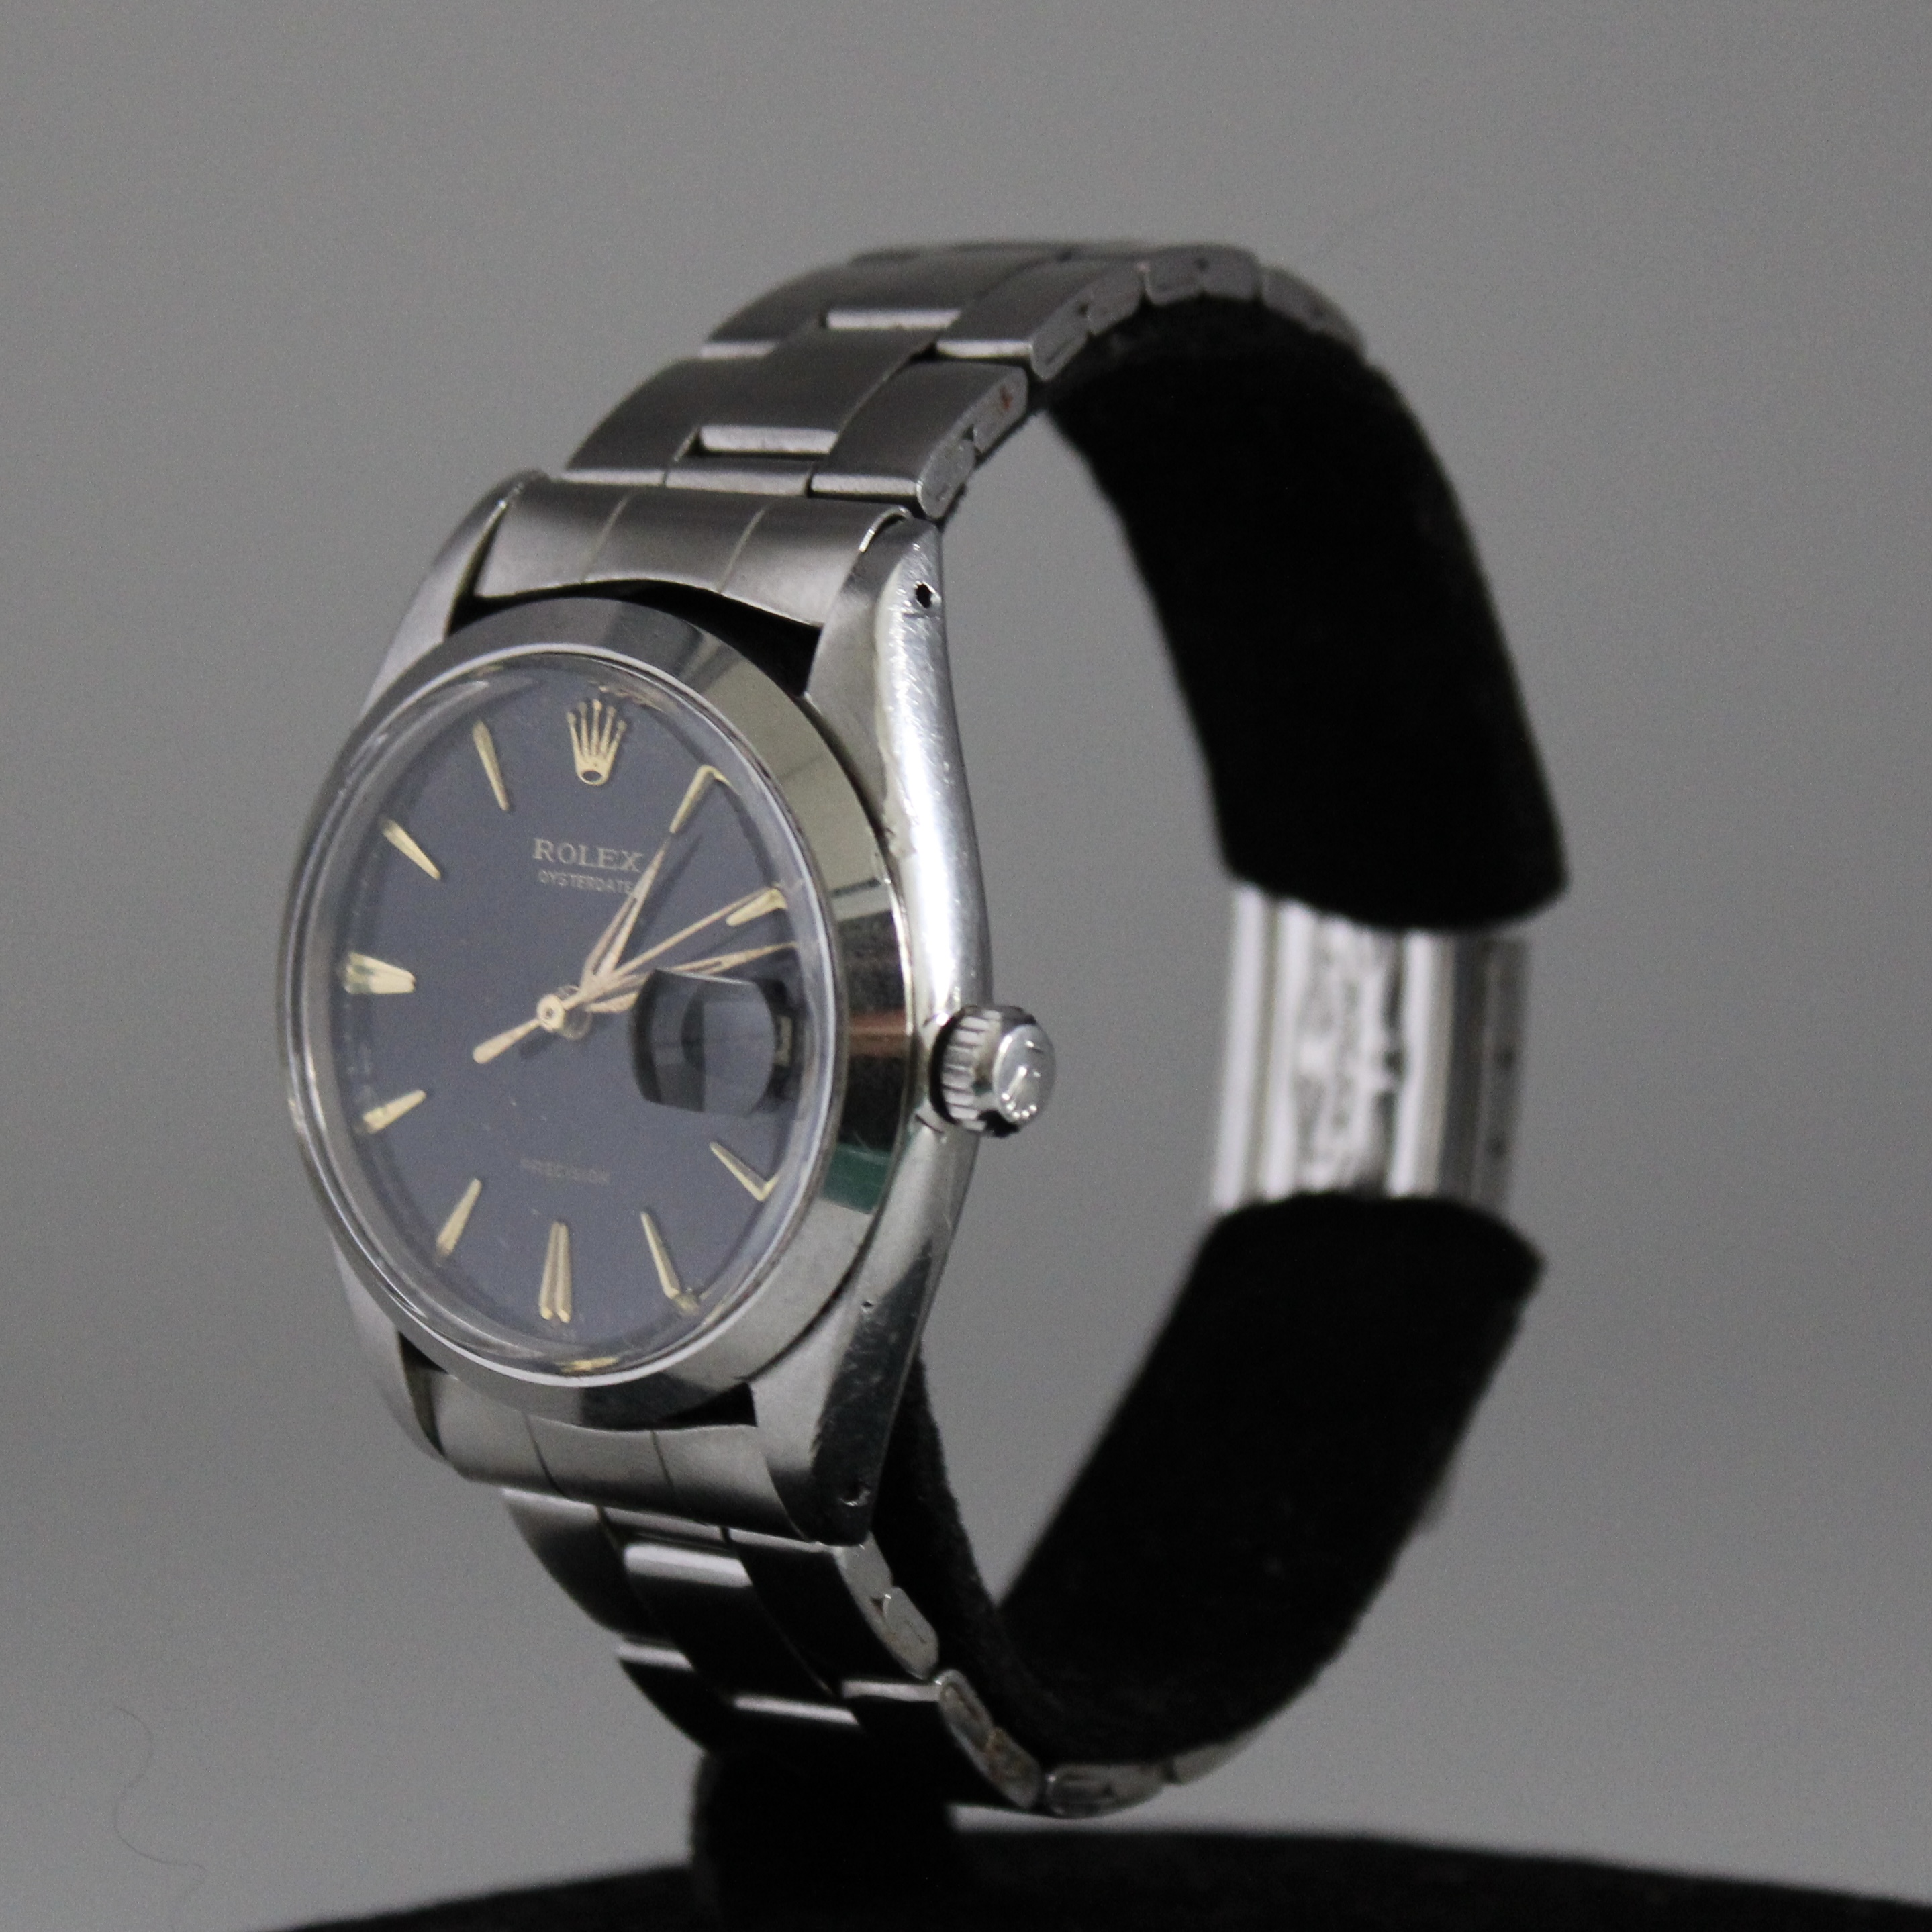 Rolex Oysterdate Precision ref 6694 - Image 2 of 6